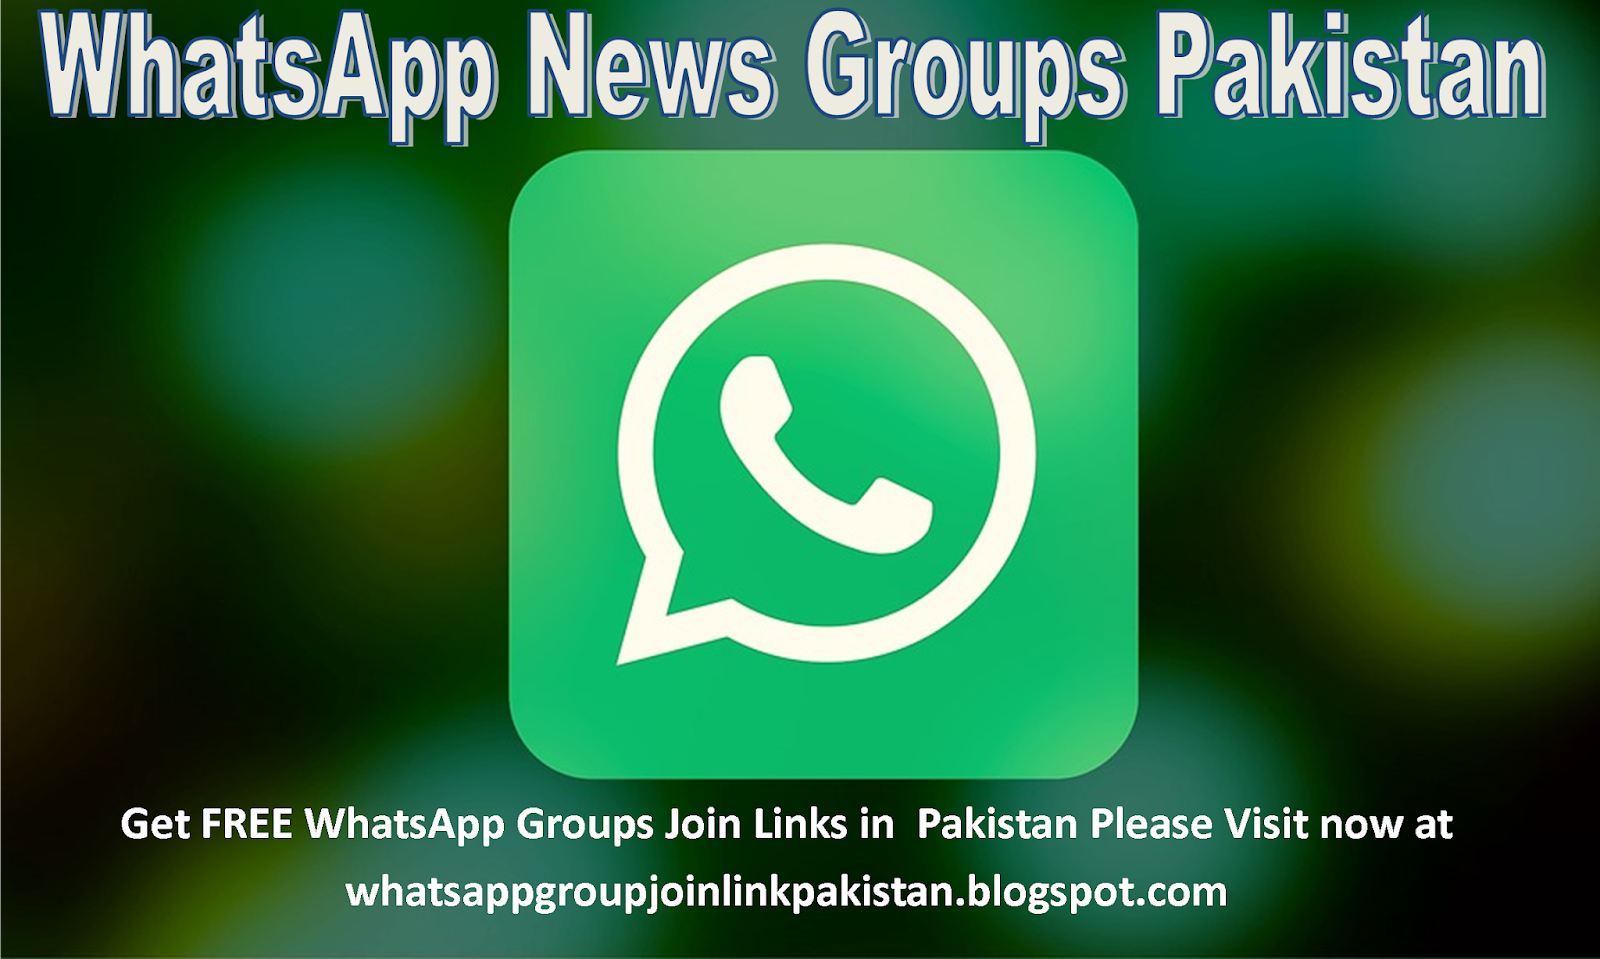 Whatsapp News Group Pakistan FREE Join Invite Links 2019/2020